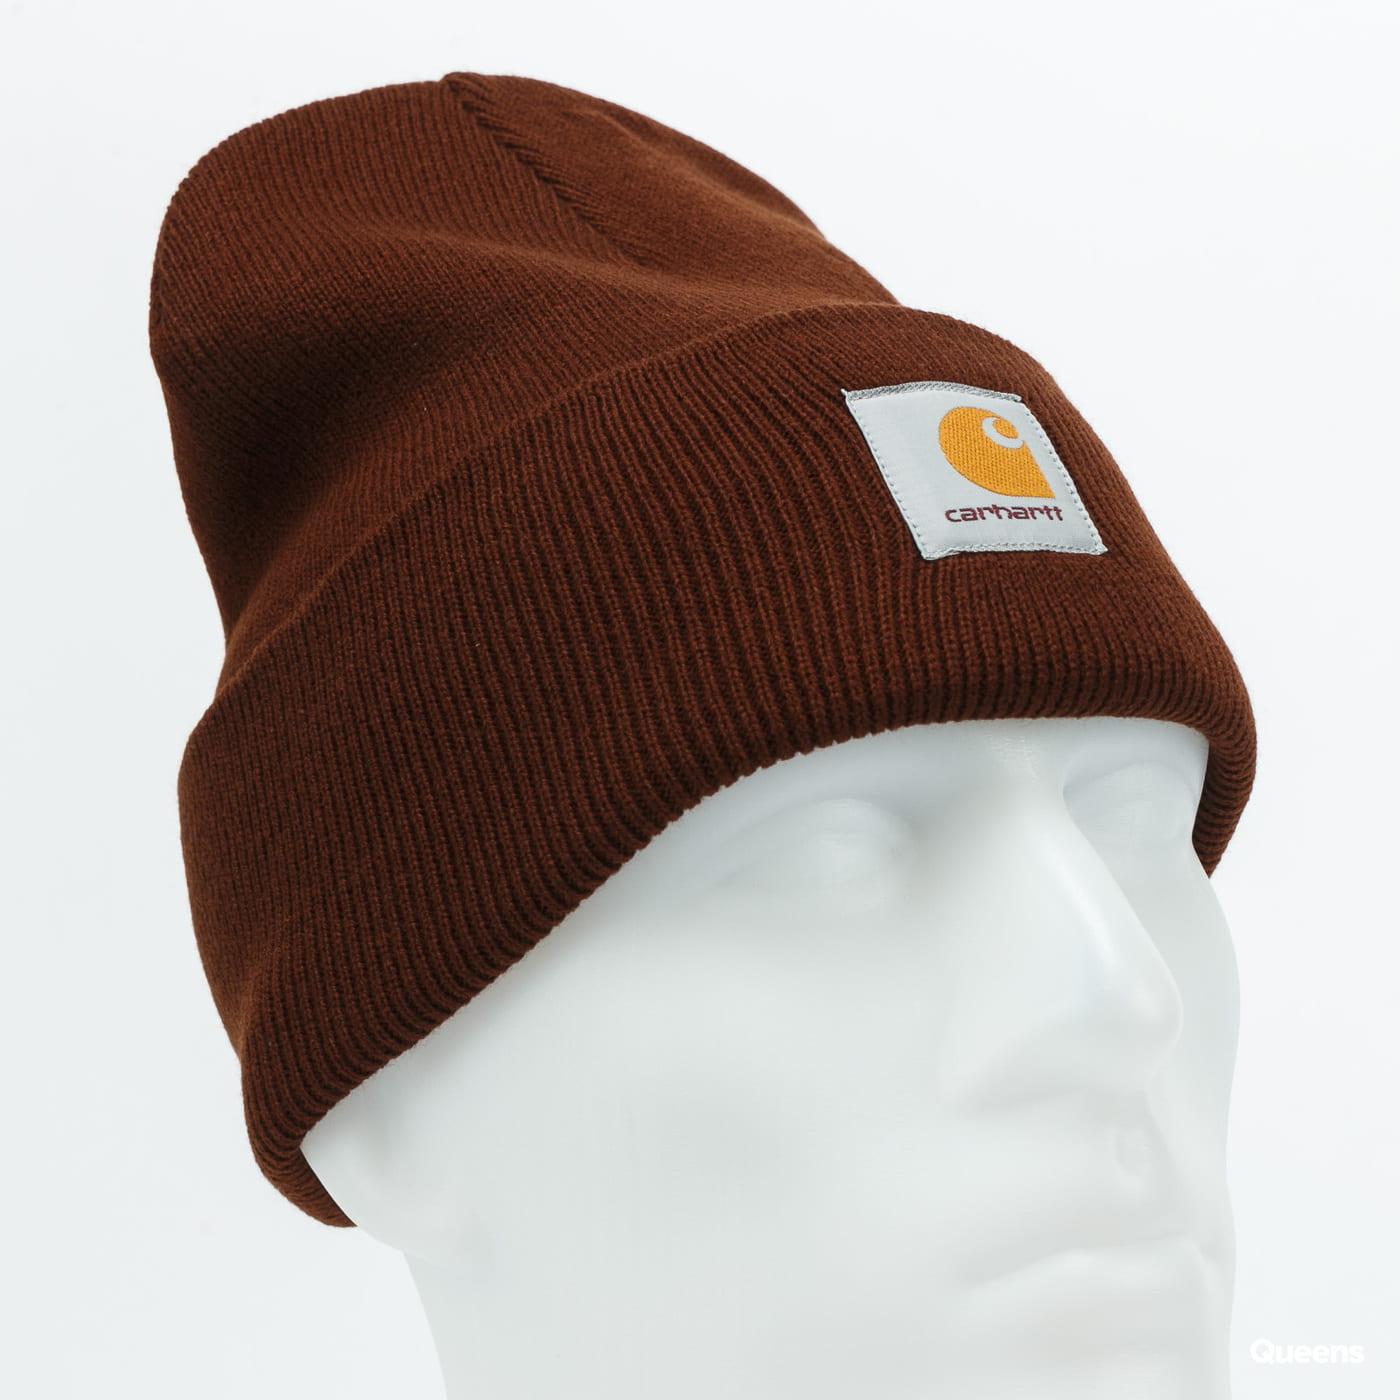 Carhartt WIP Acrylic Watch Hat dark brown